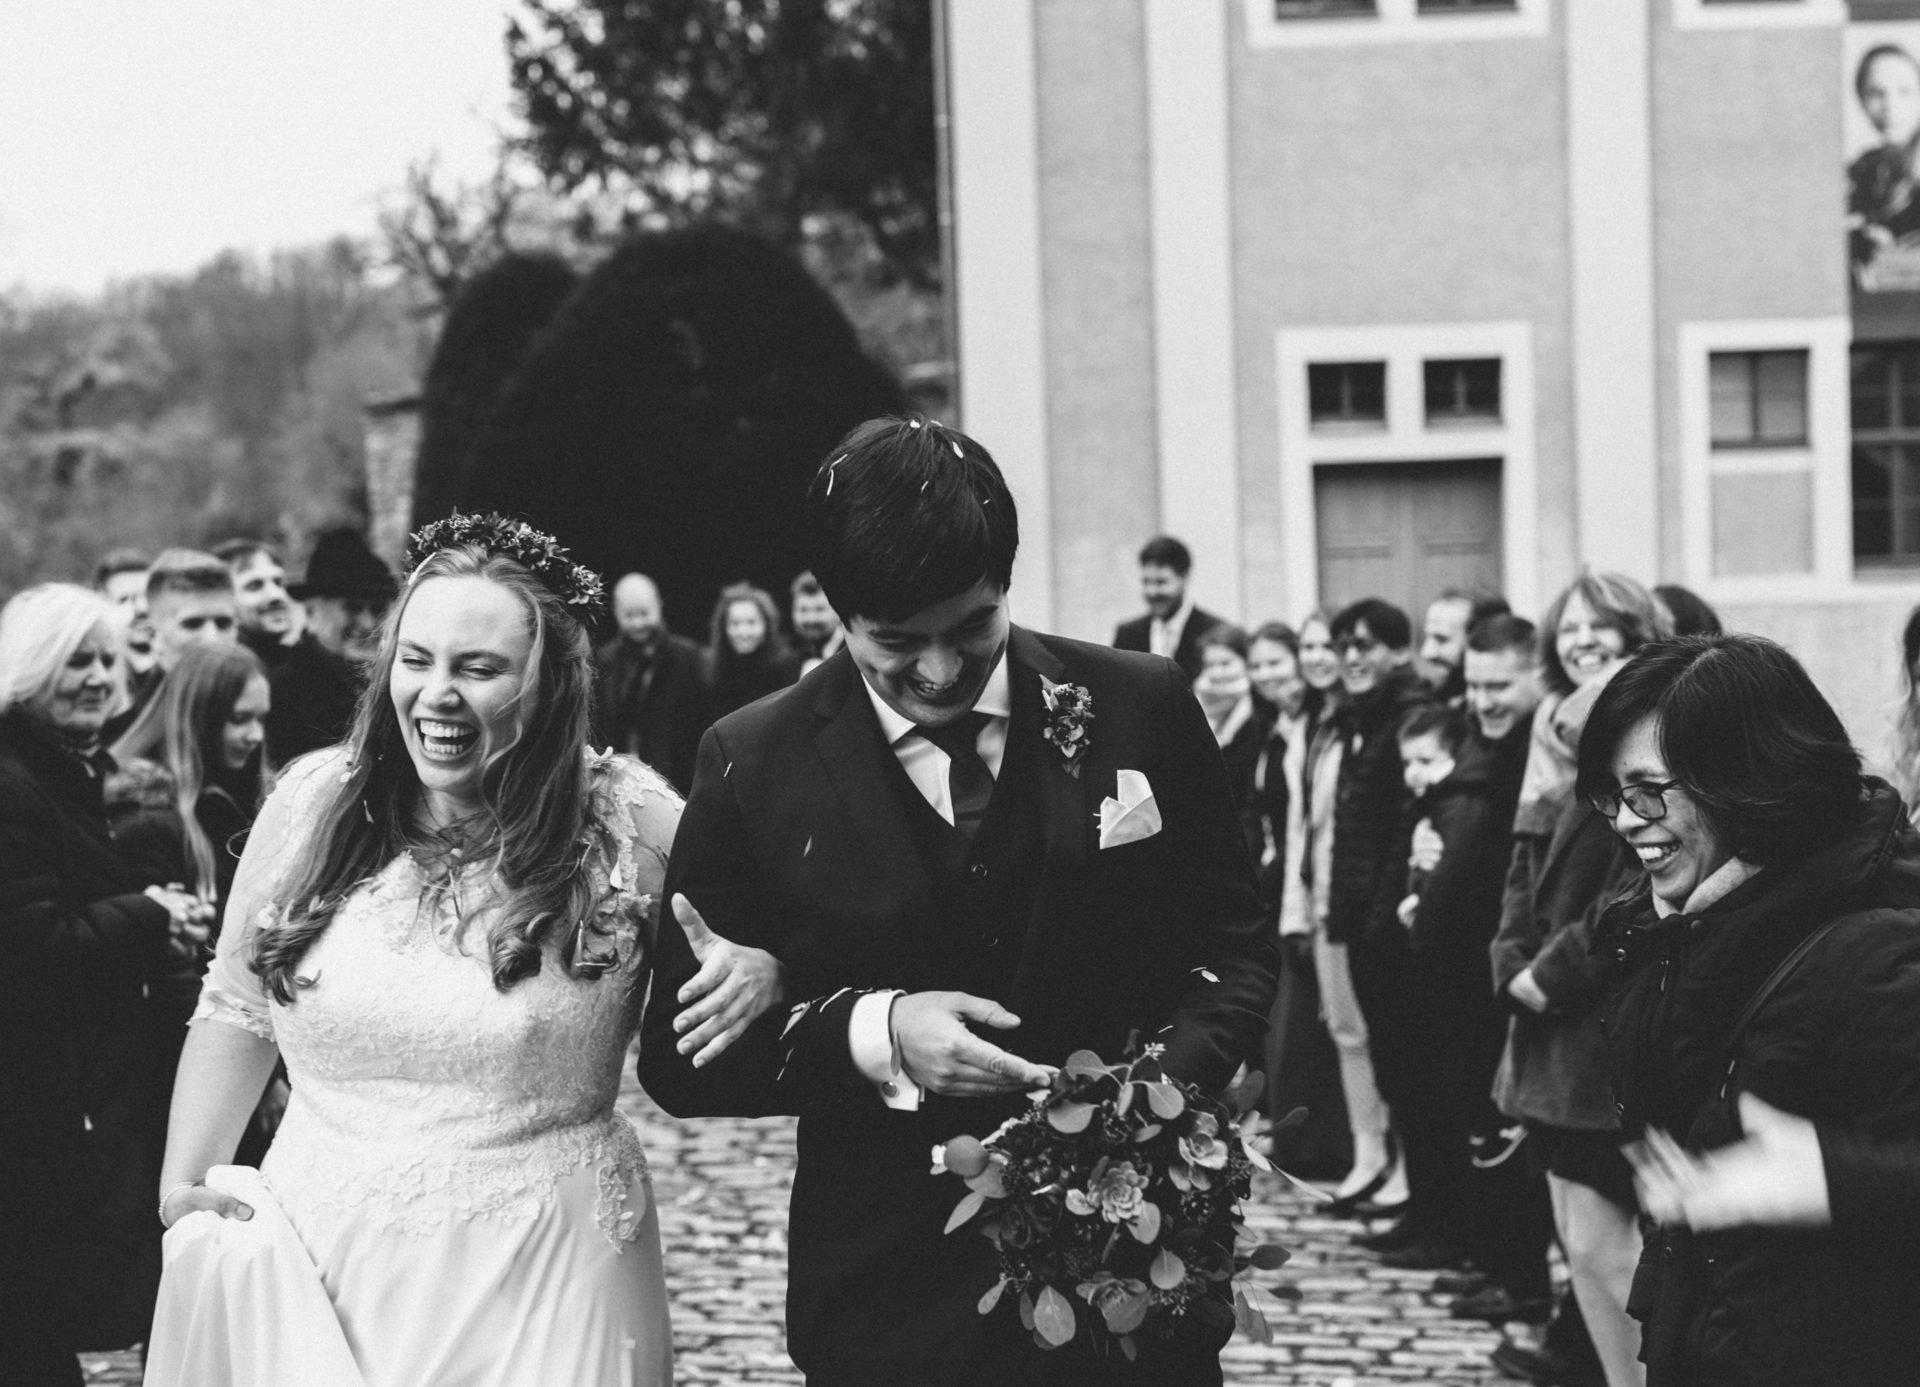 50mmfreunde Erfurt Jena Weimar Ettersburg Hochzeit 38 1920x1387 - Dezemberhochzeit im Schloss Ettersburg bei Weimar